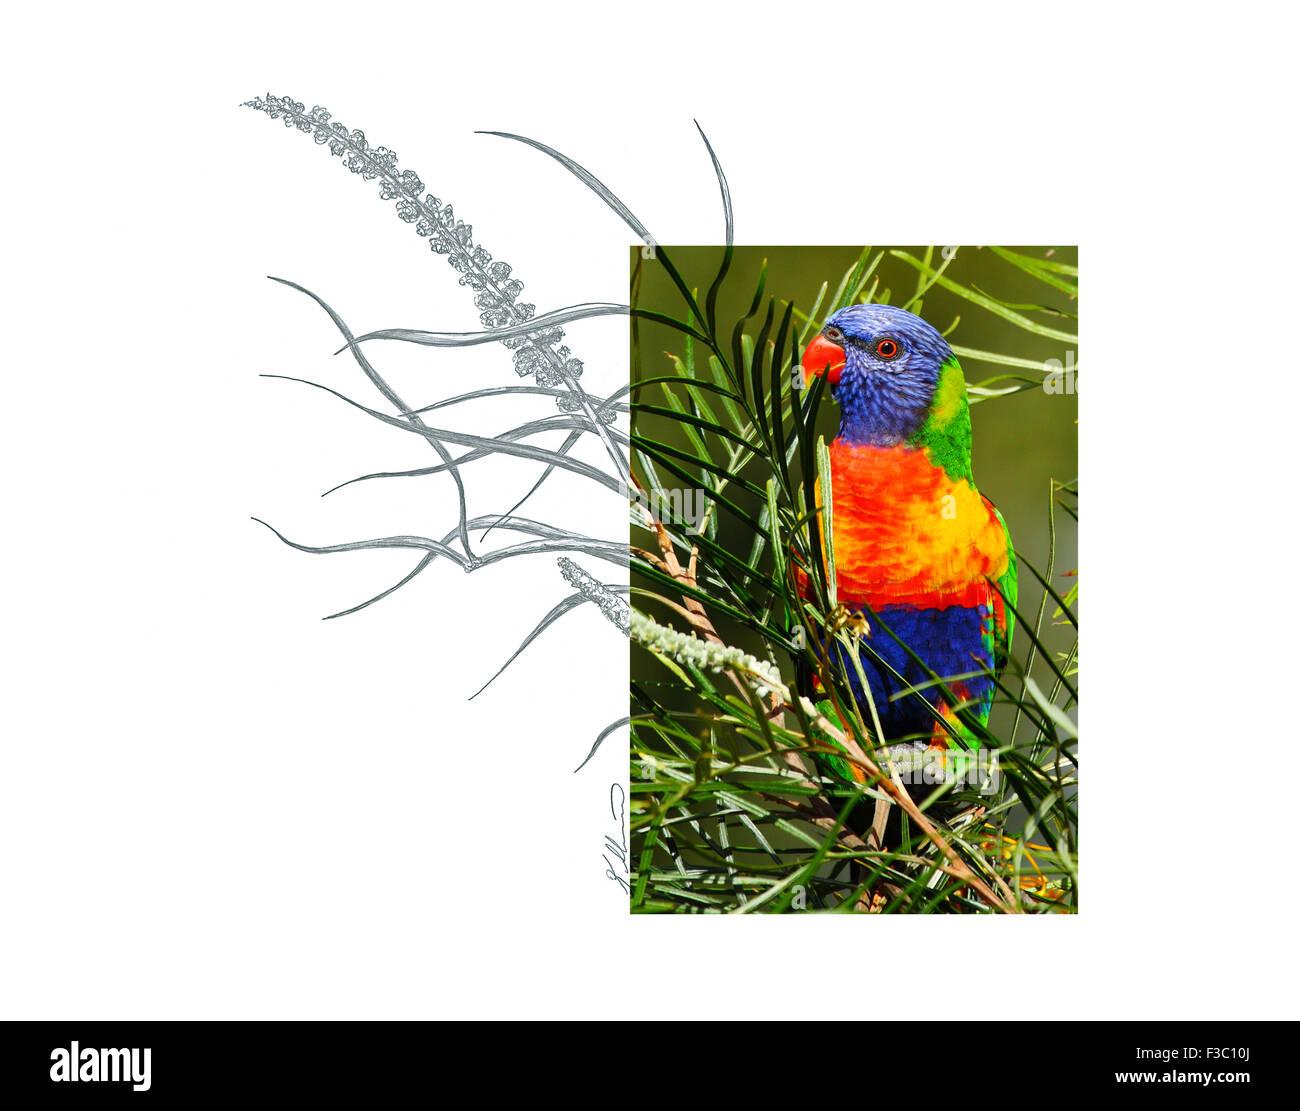 Parrot Bird Sketch Stockfotos & Parrot Bird Sketch Bilder - Alamy